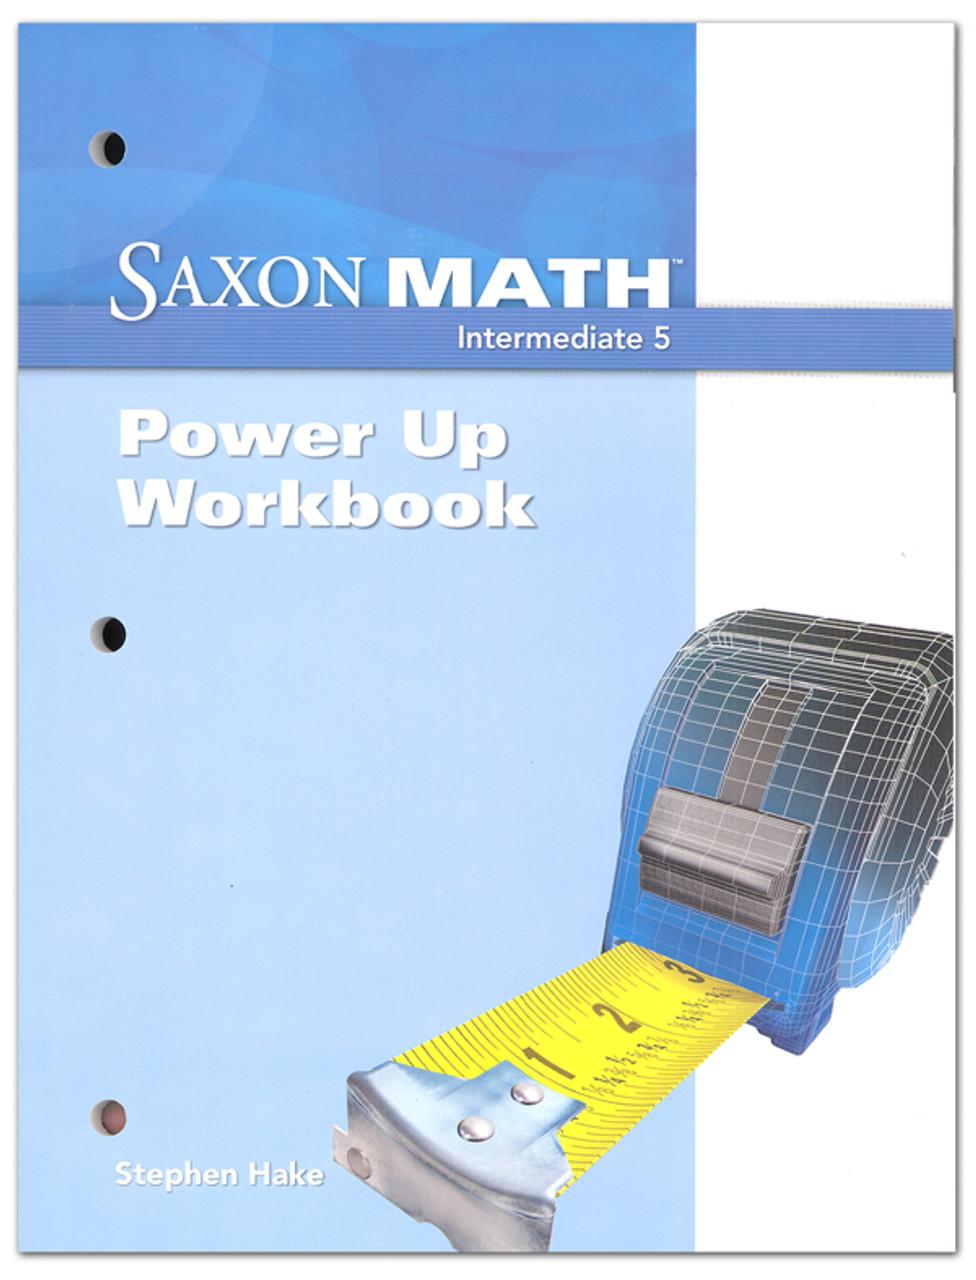 medium resolution of Saxon Math Grade 5 Intermediate Power Up Workbook - Classroom Resource  Center